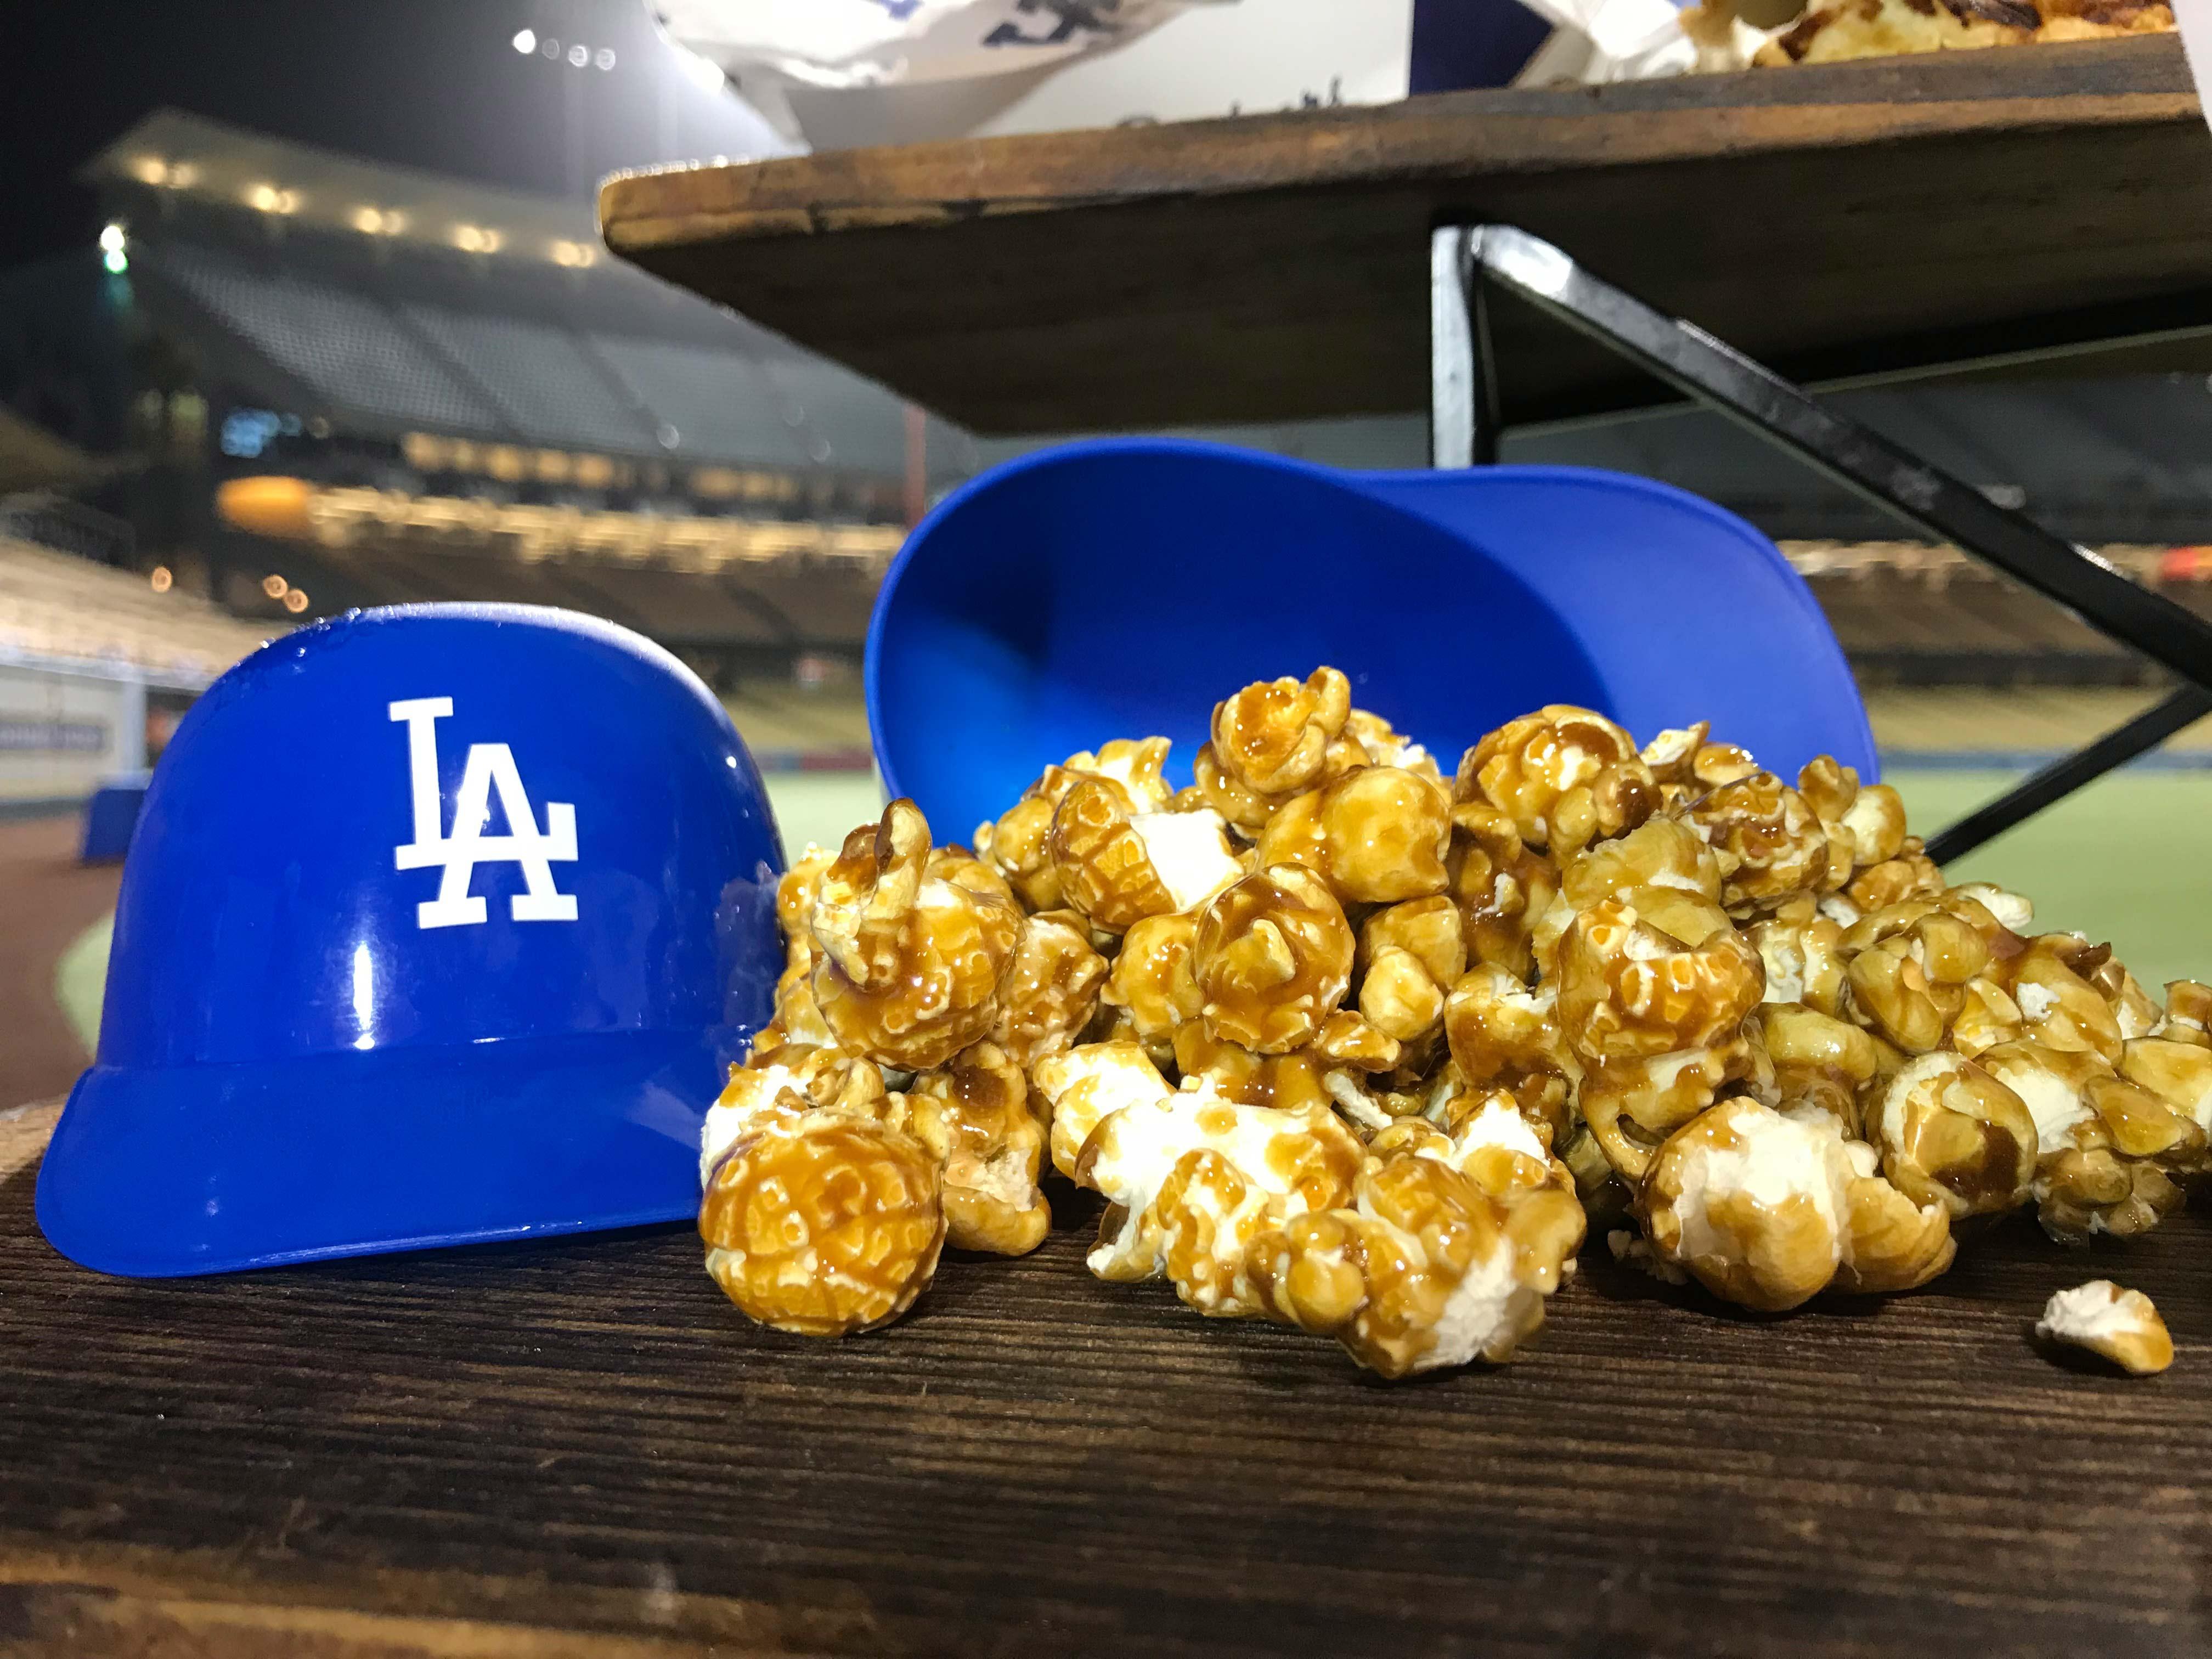 <div class='meta'><div class='origin-logo' data-origin='none'></div><span class='caption-text' data-credit='KABC'>Try out some popcorn on your next visit to Dodger Stadium.</span></div>